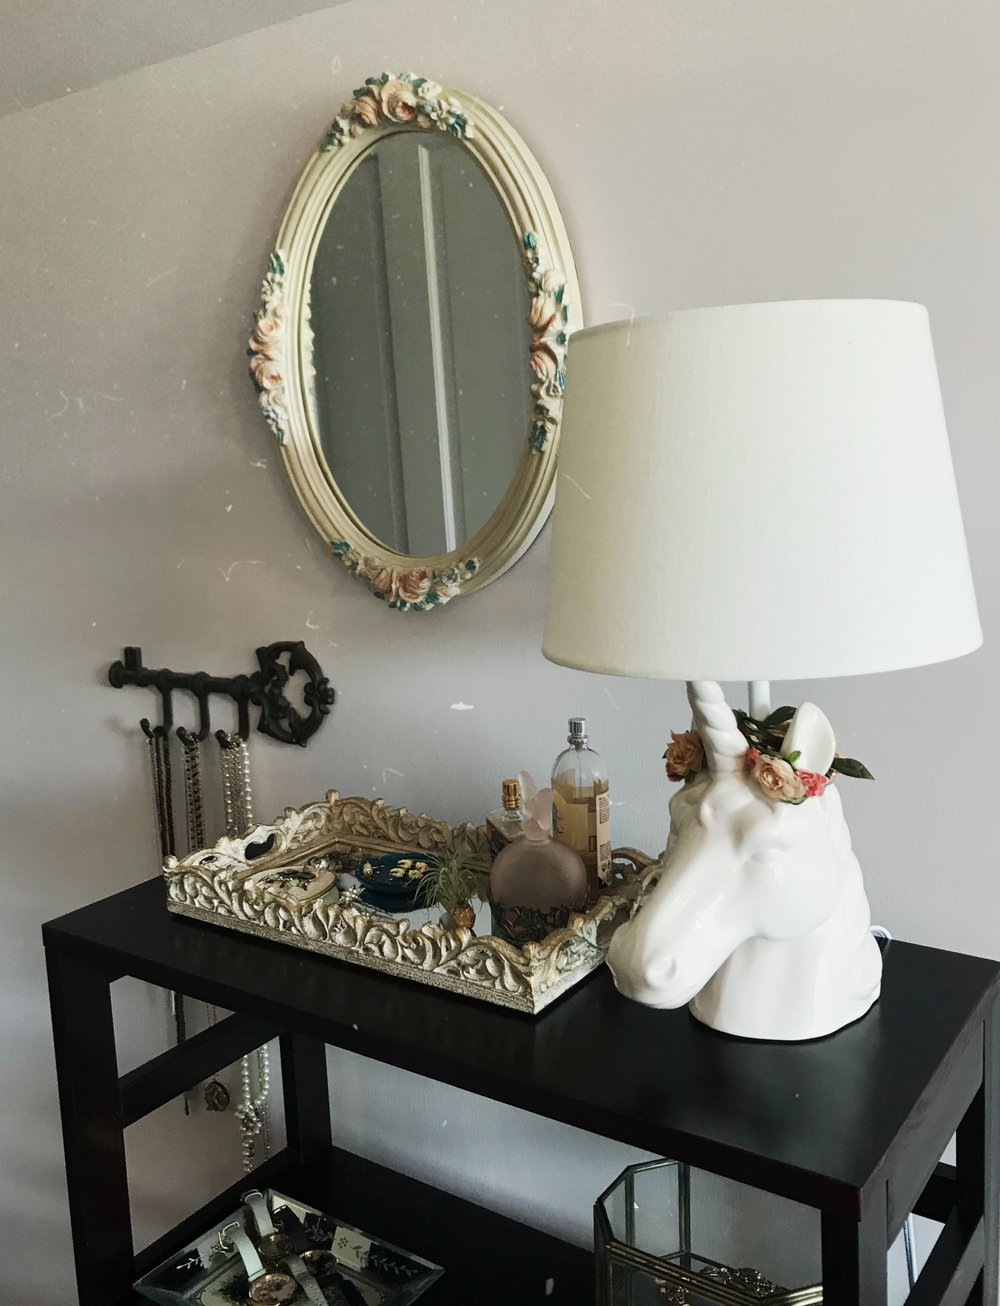 unicorn-lamp-target-vanity-tray.JPG